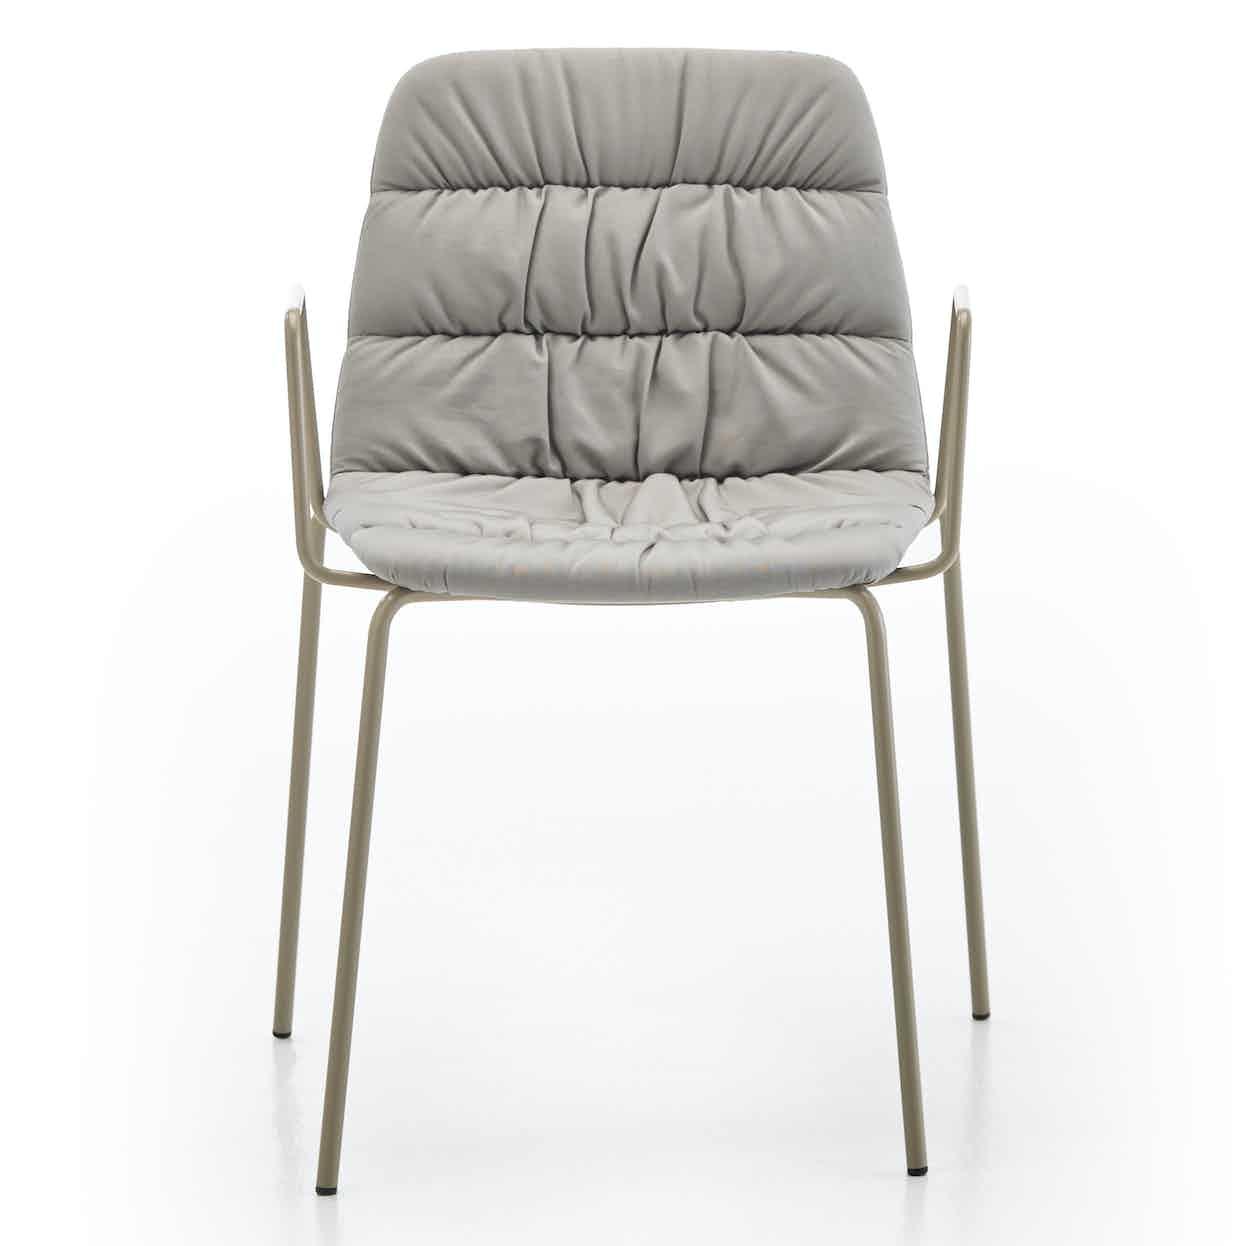 Viccarbe-maarten-chair-grey-metal-frame-haute-living